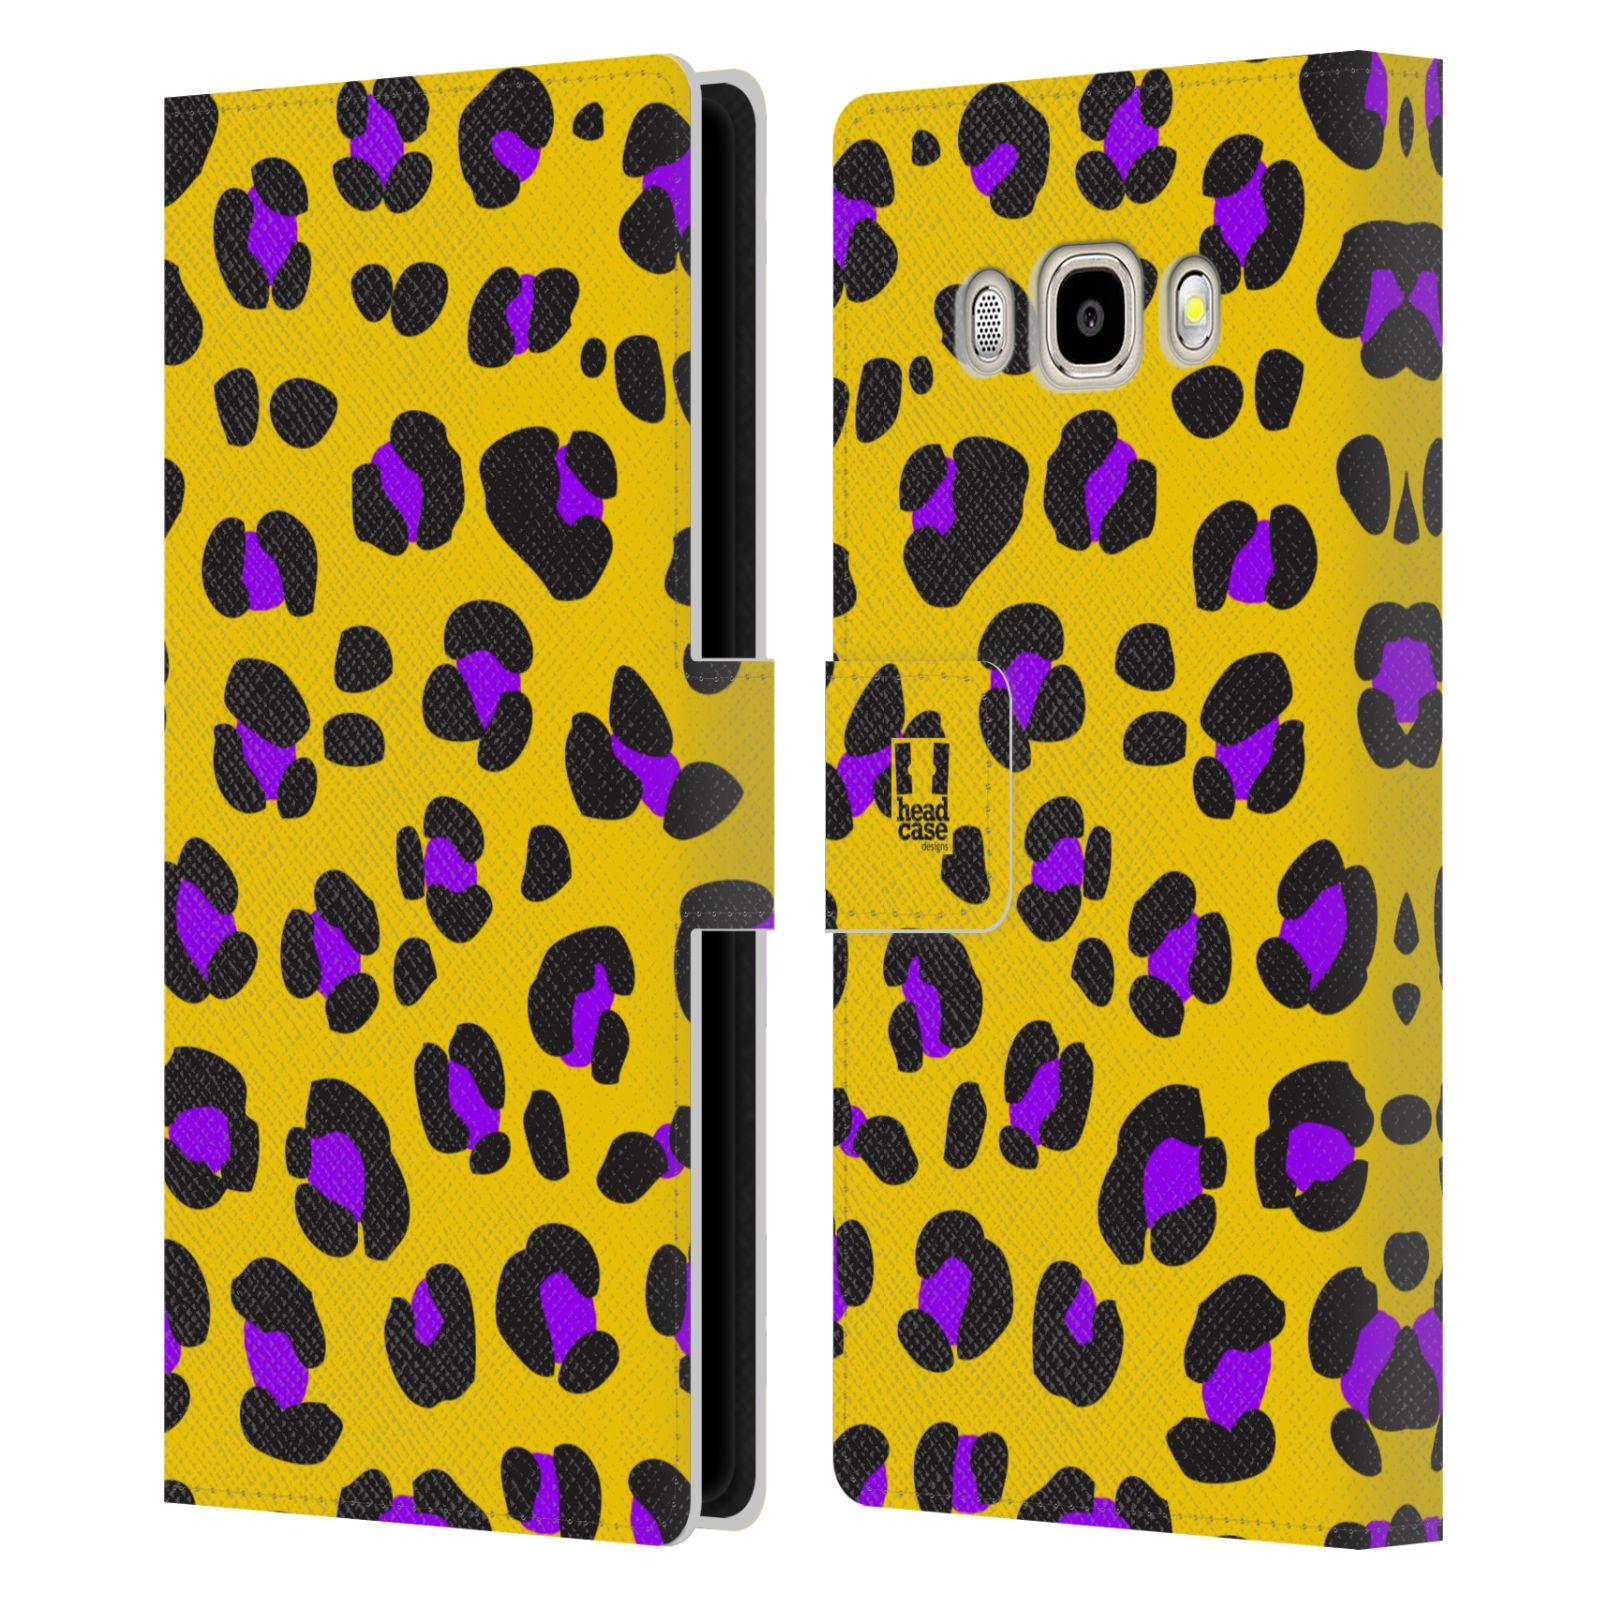 HEAD CASE Flipové pouzdro pro mobil Samsung Galaxy J5 2016 Zvířecí barevné vzory žlutý leopard fialové skvrny